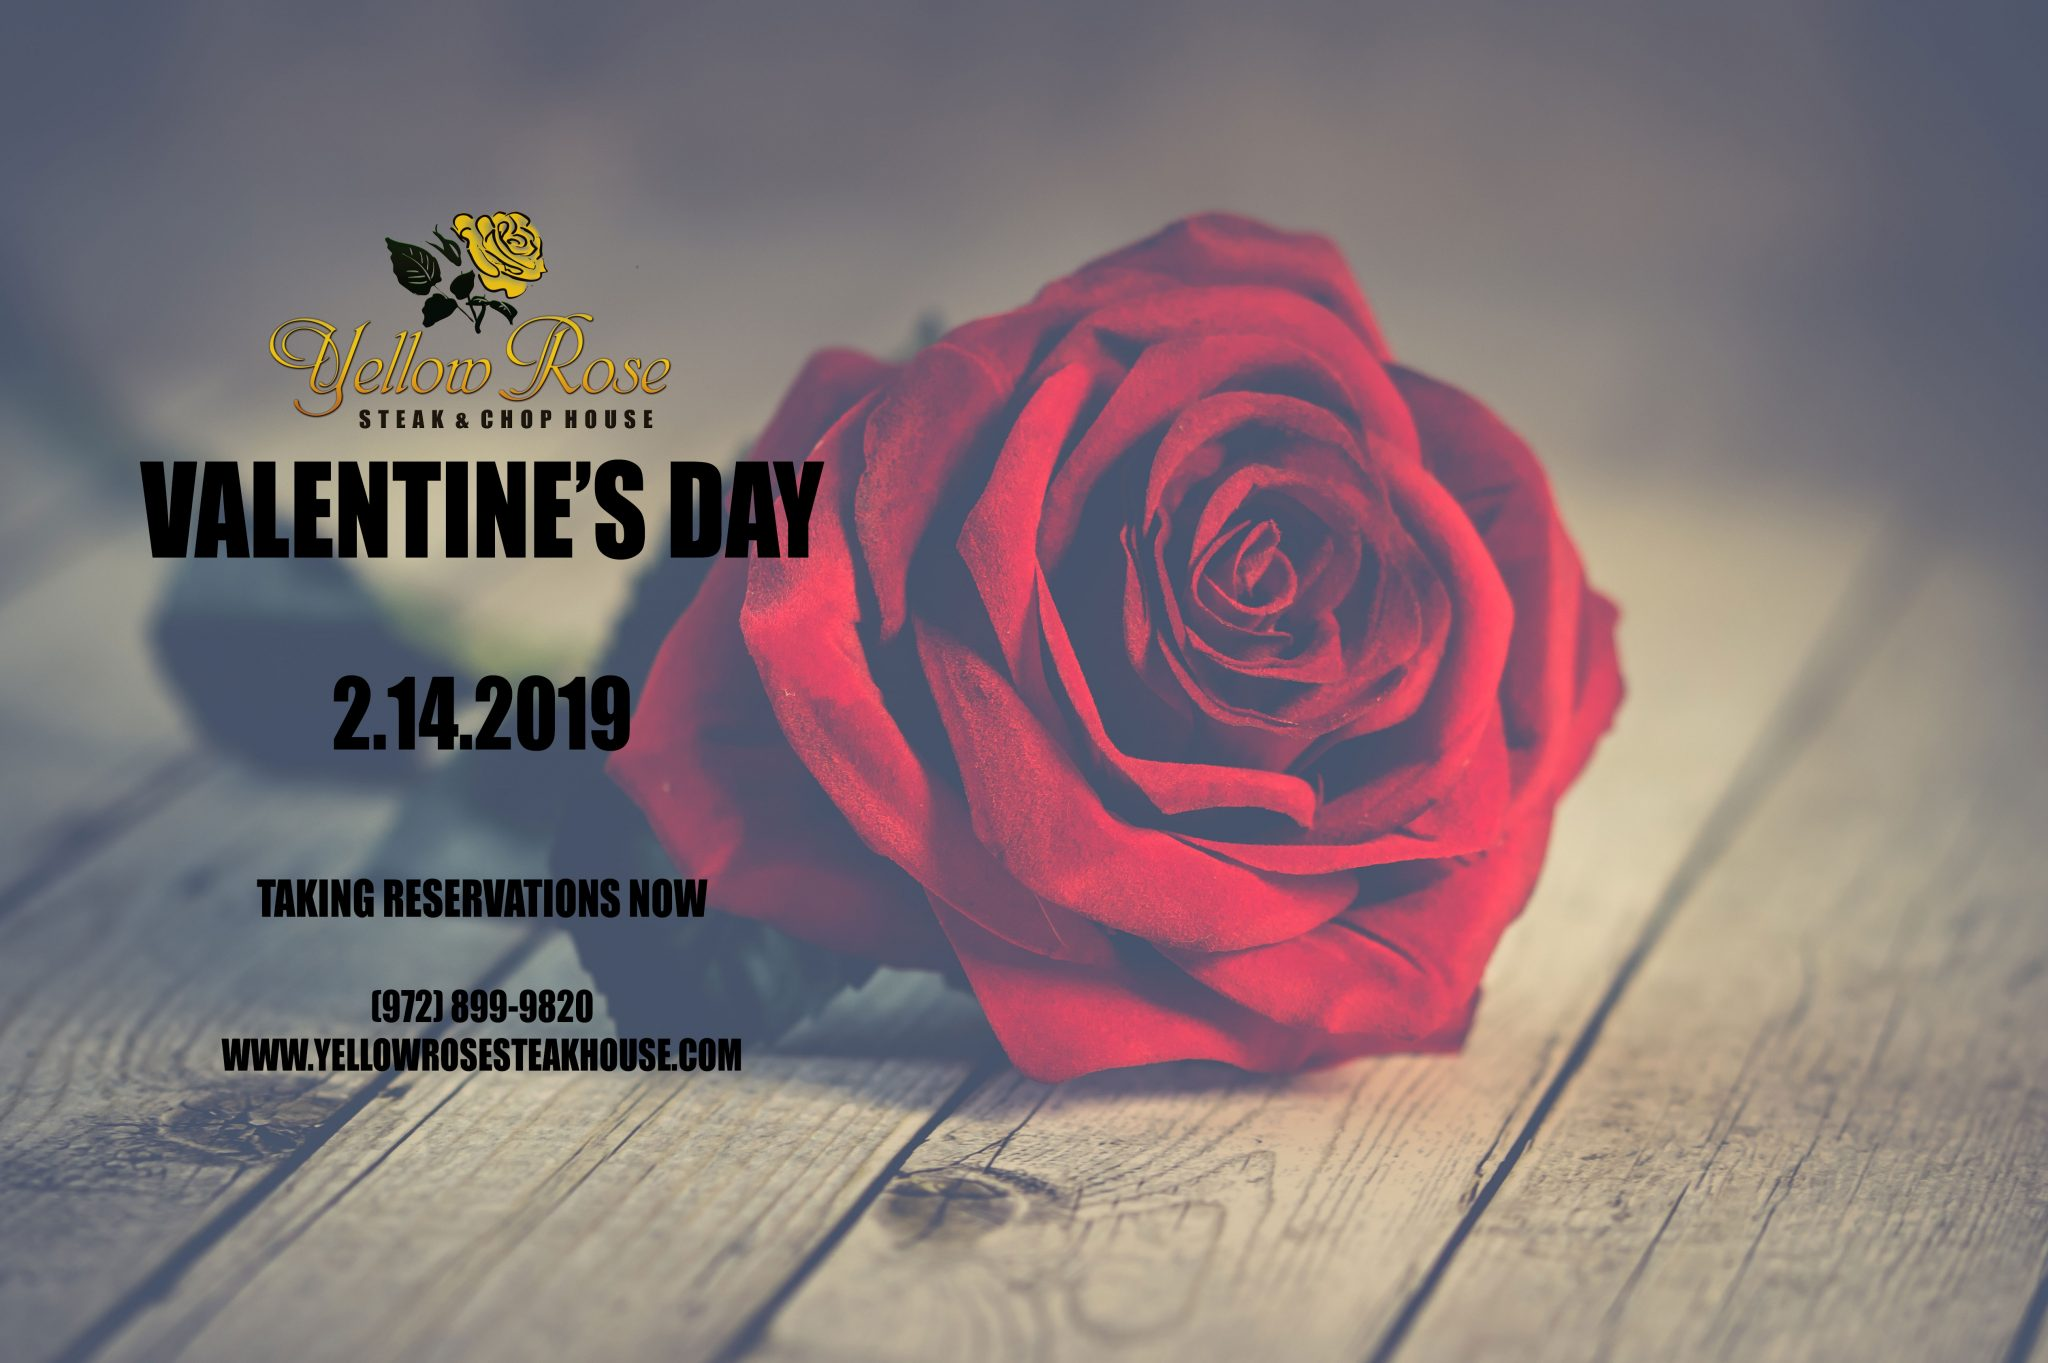 Valentines Day 2019 Yellow Rose Steak Chop House